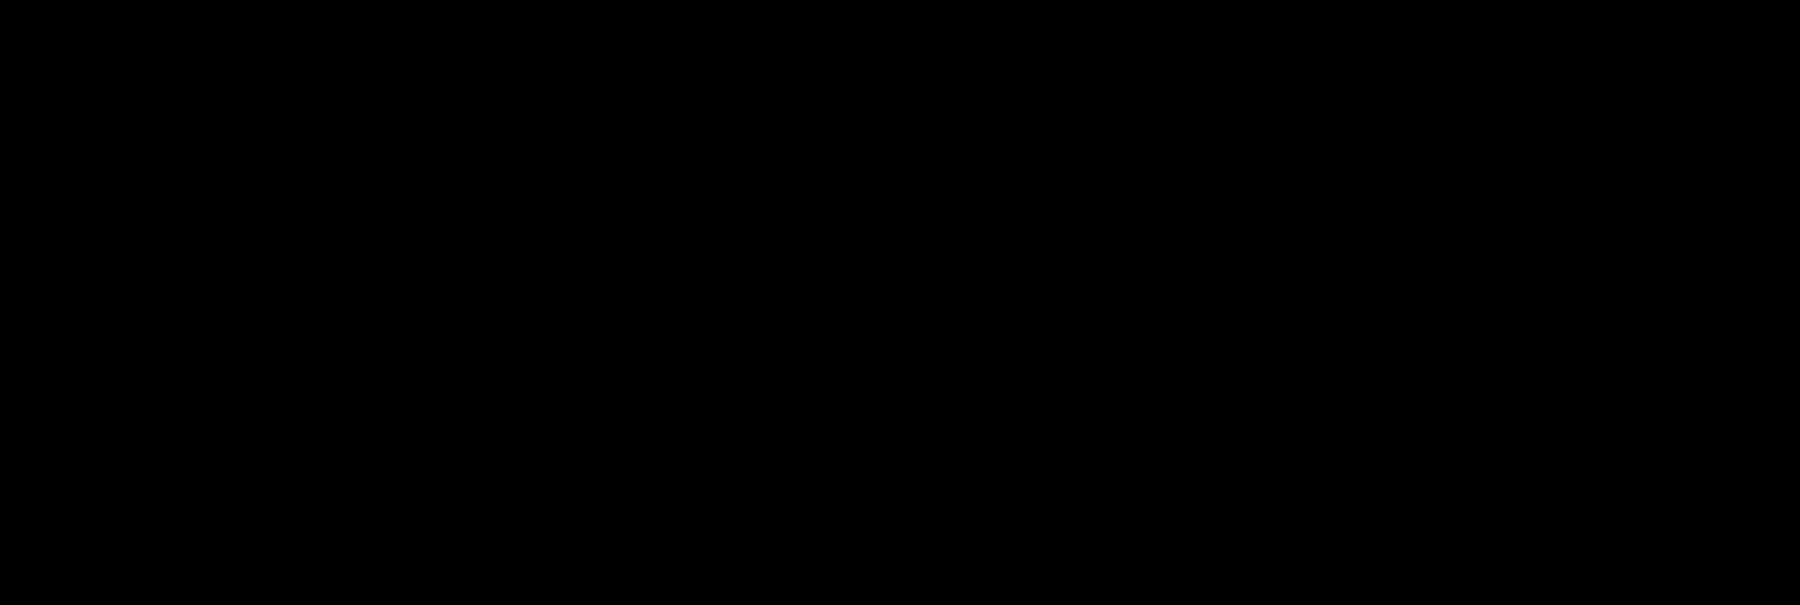 PattisonOutdoor-Black.png